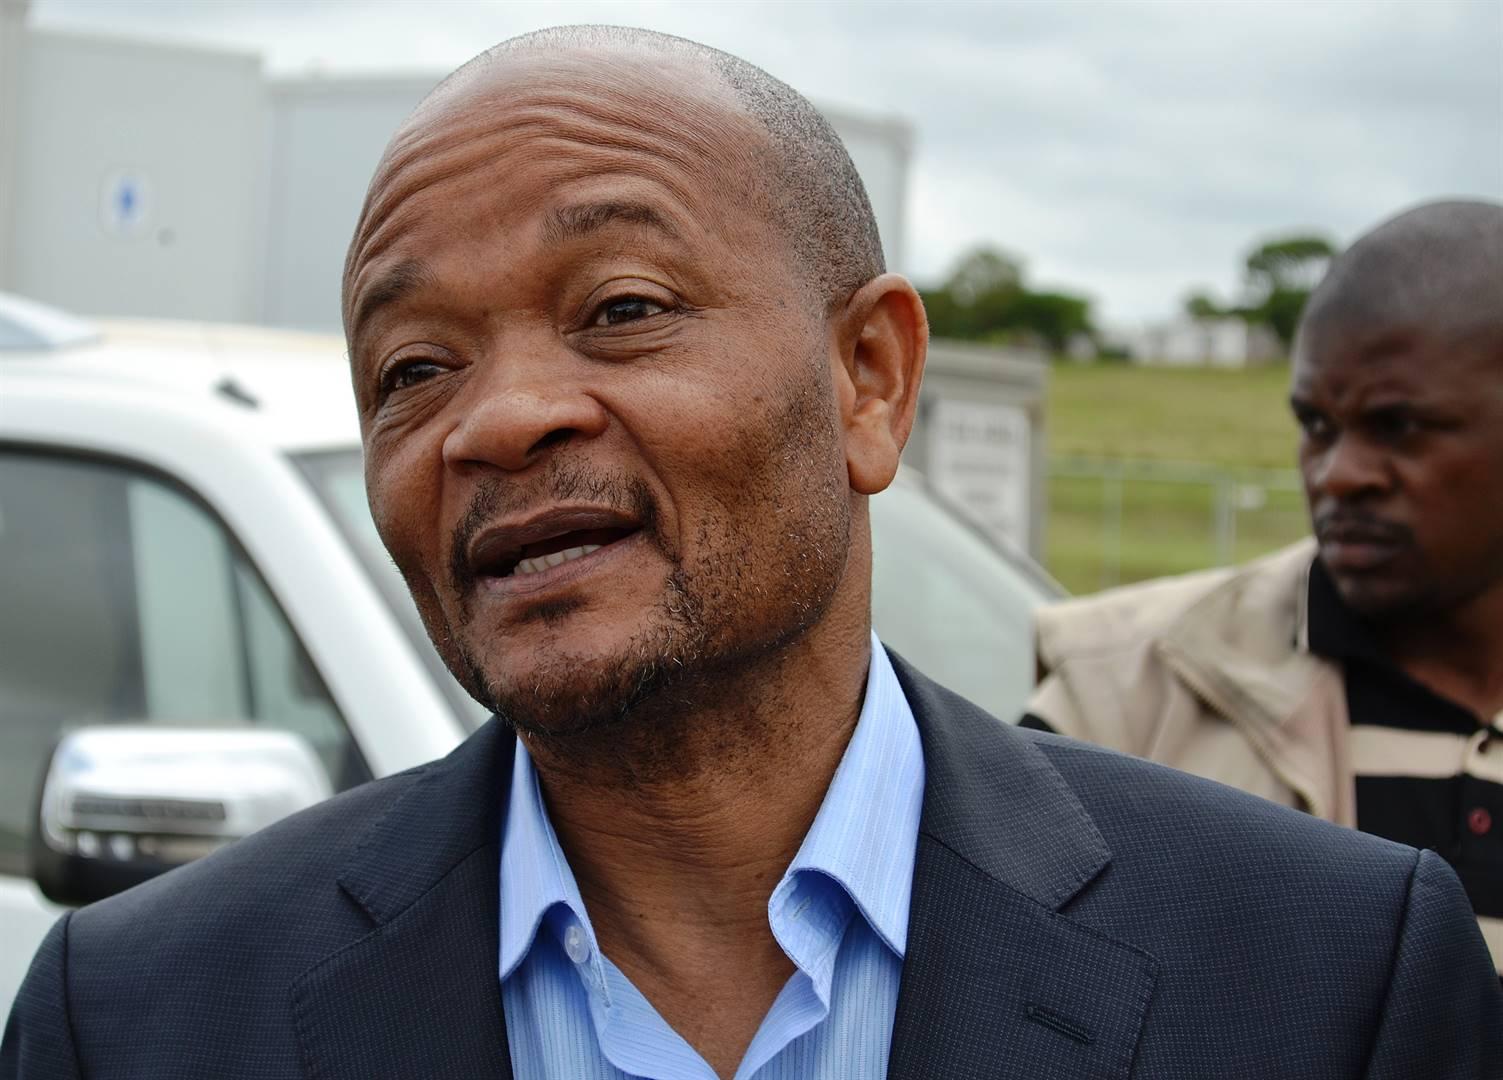 Nehawu accuses Mchunu of misleading SA over wage agreement